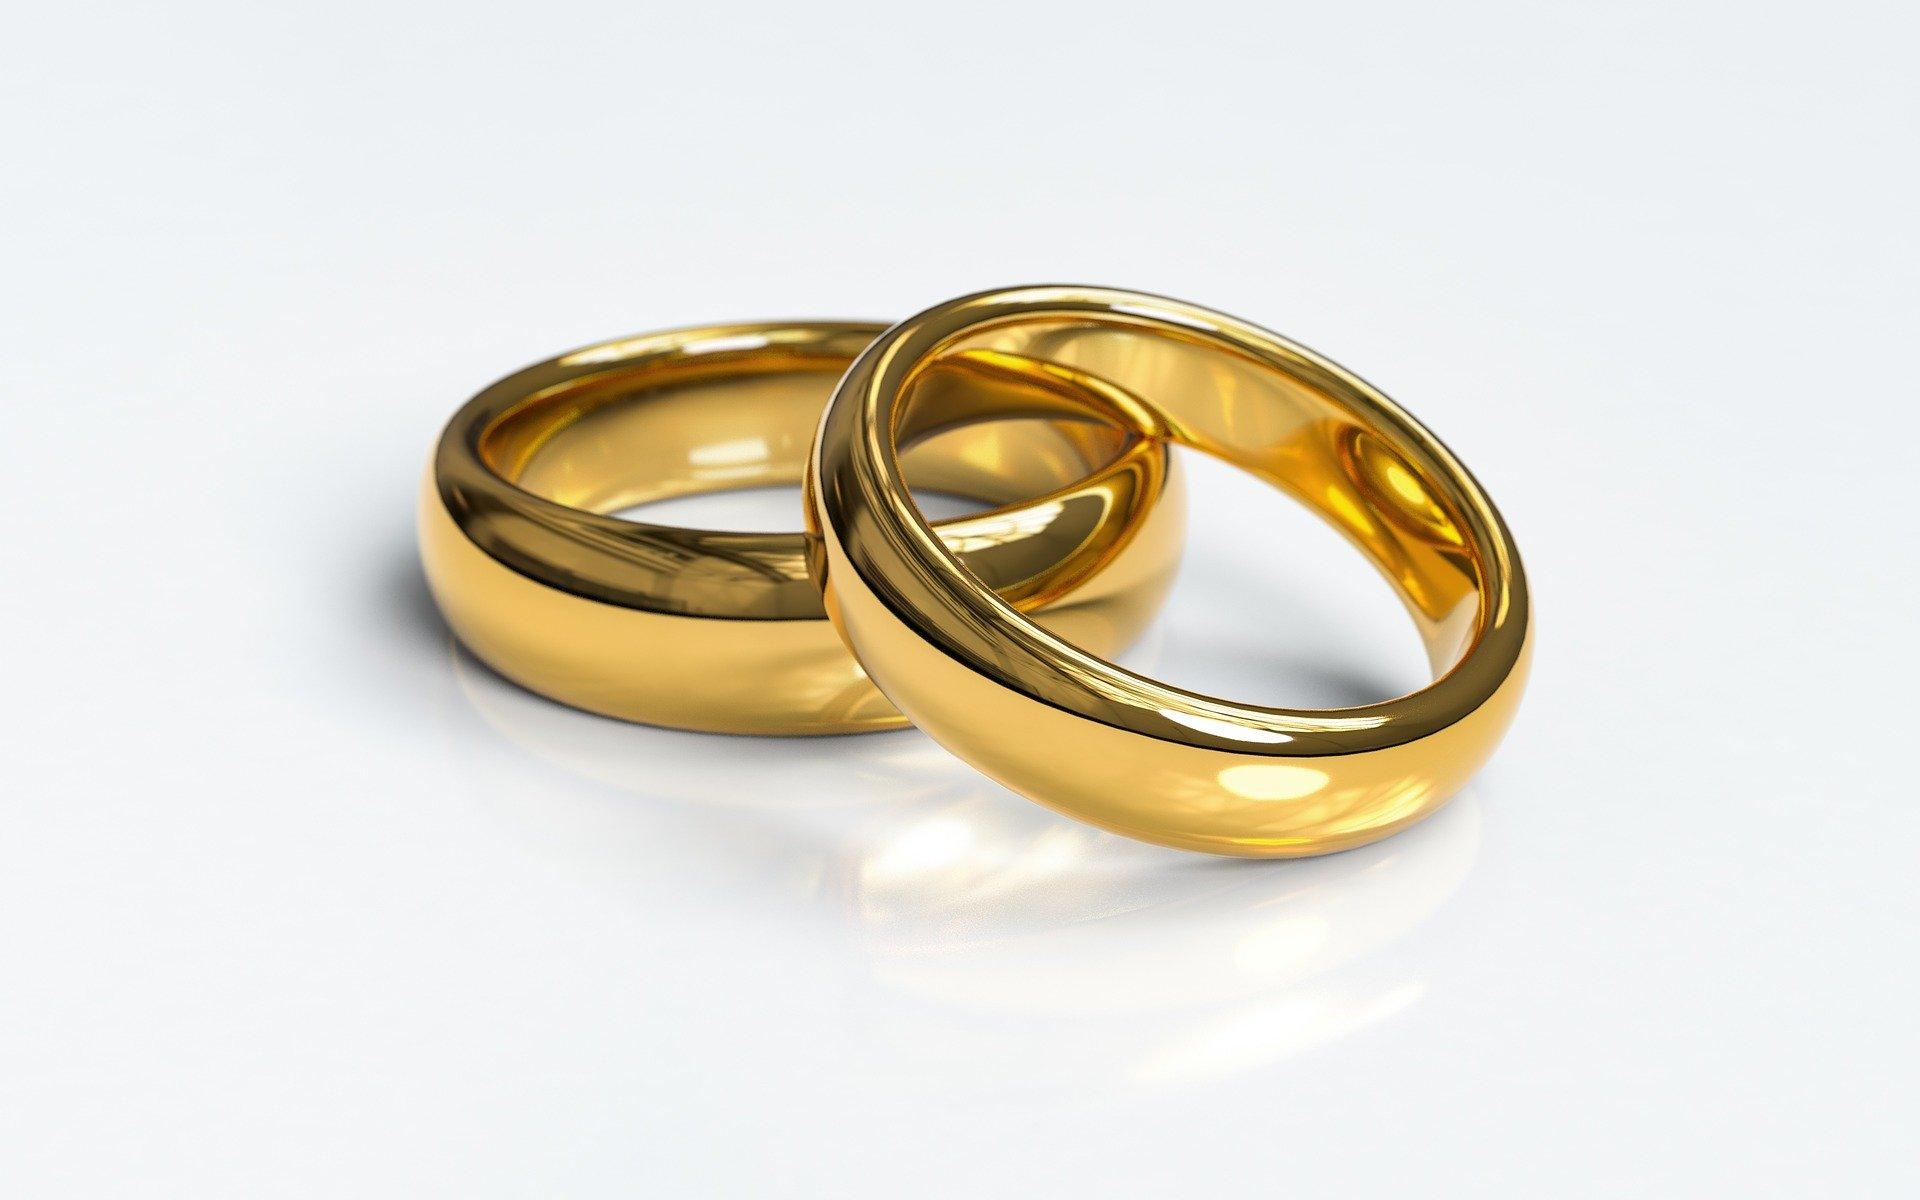 wedding rings 3611277 1920